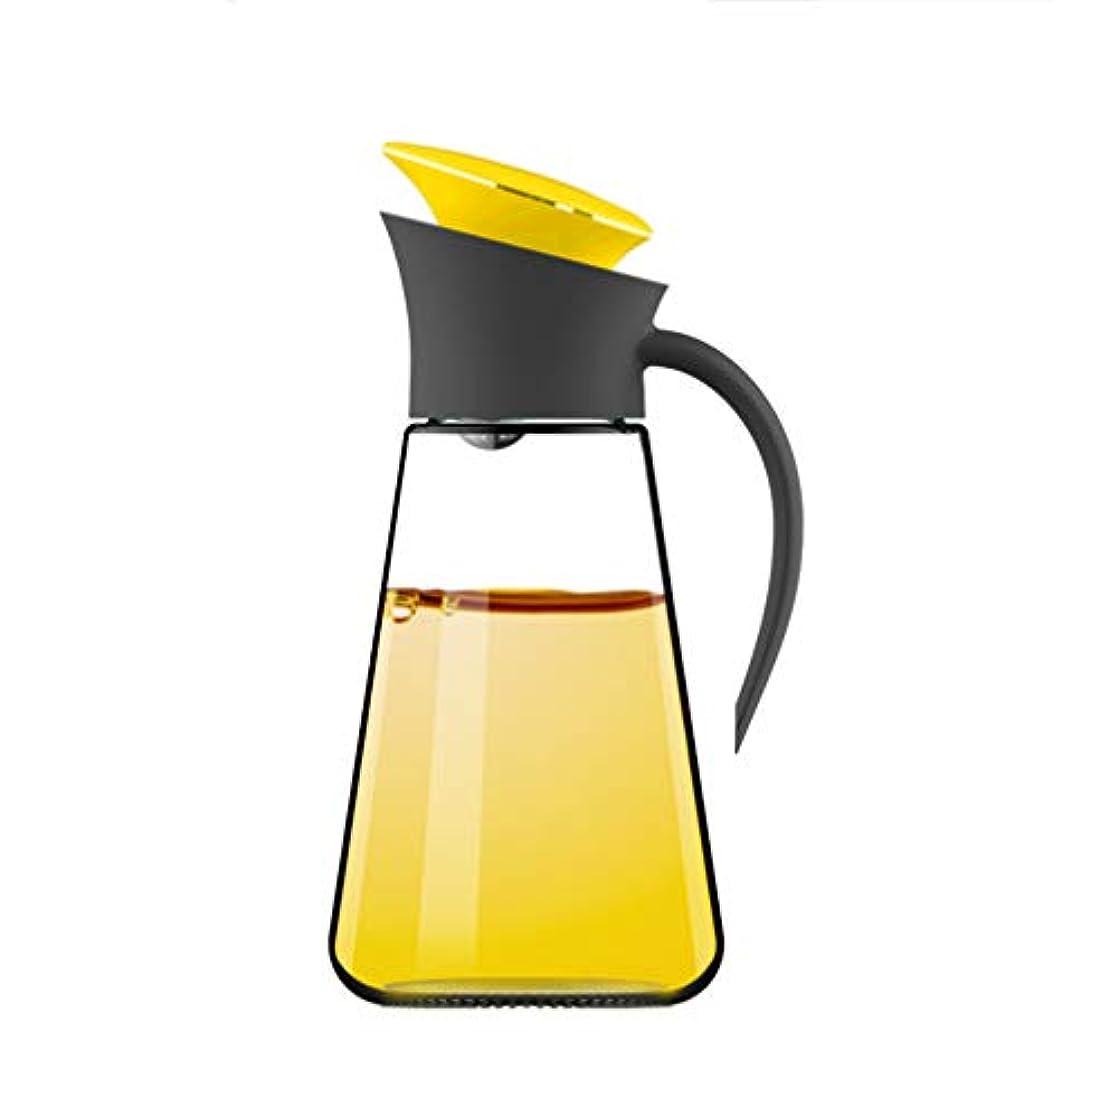 Qualizon 550ml Glass Oil Pot with Automatic Open Close Cap,Leak Proof Olive Oil Dispenser with Non Slip Handle Soy Sauce Vinegar Cruet(Yellow) kbzsadpi16839